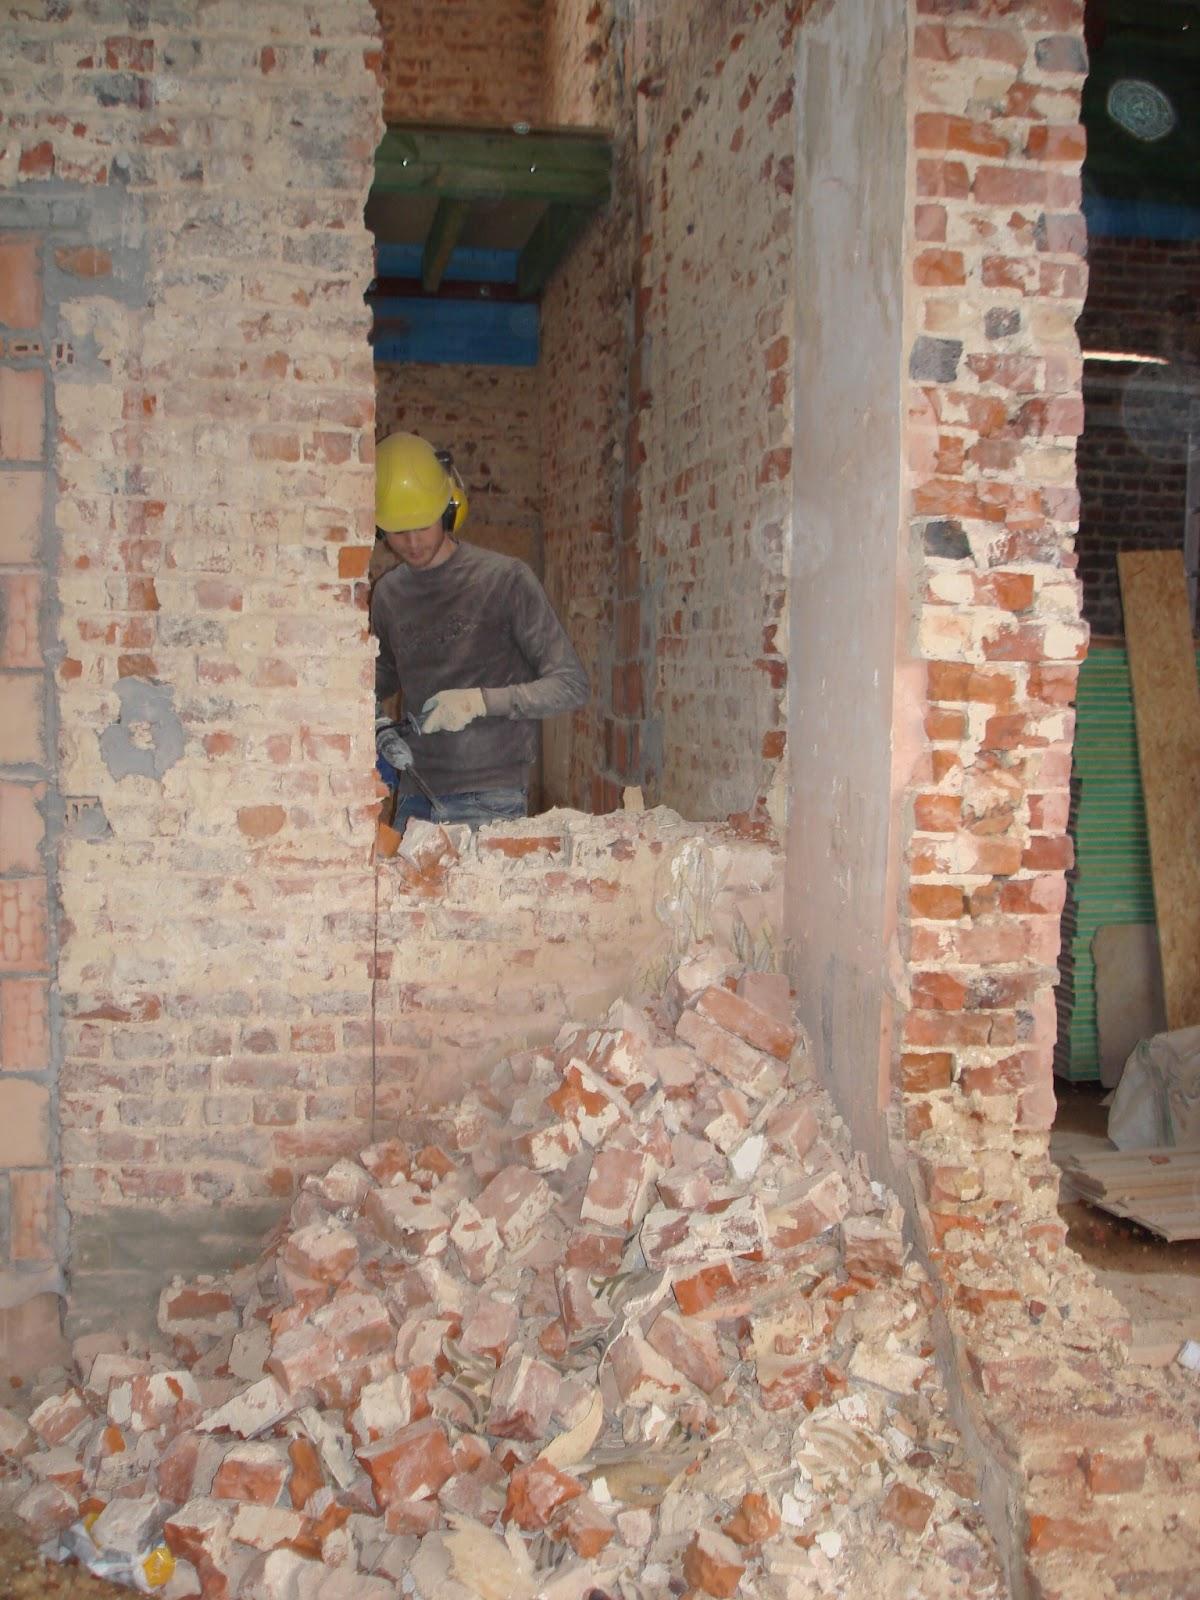 Lusthuizenlaan verder openingen maken for Vloerplan maken